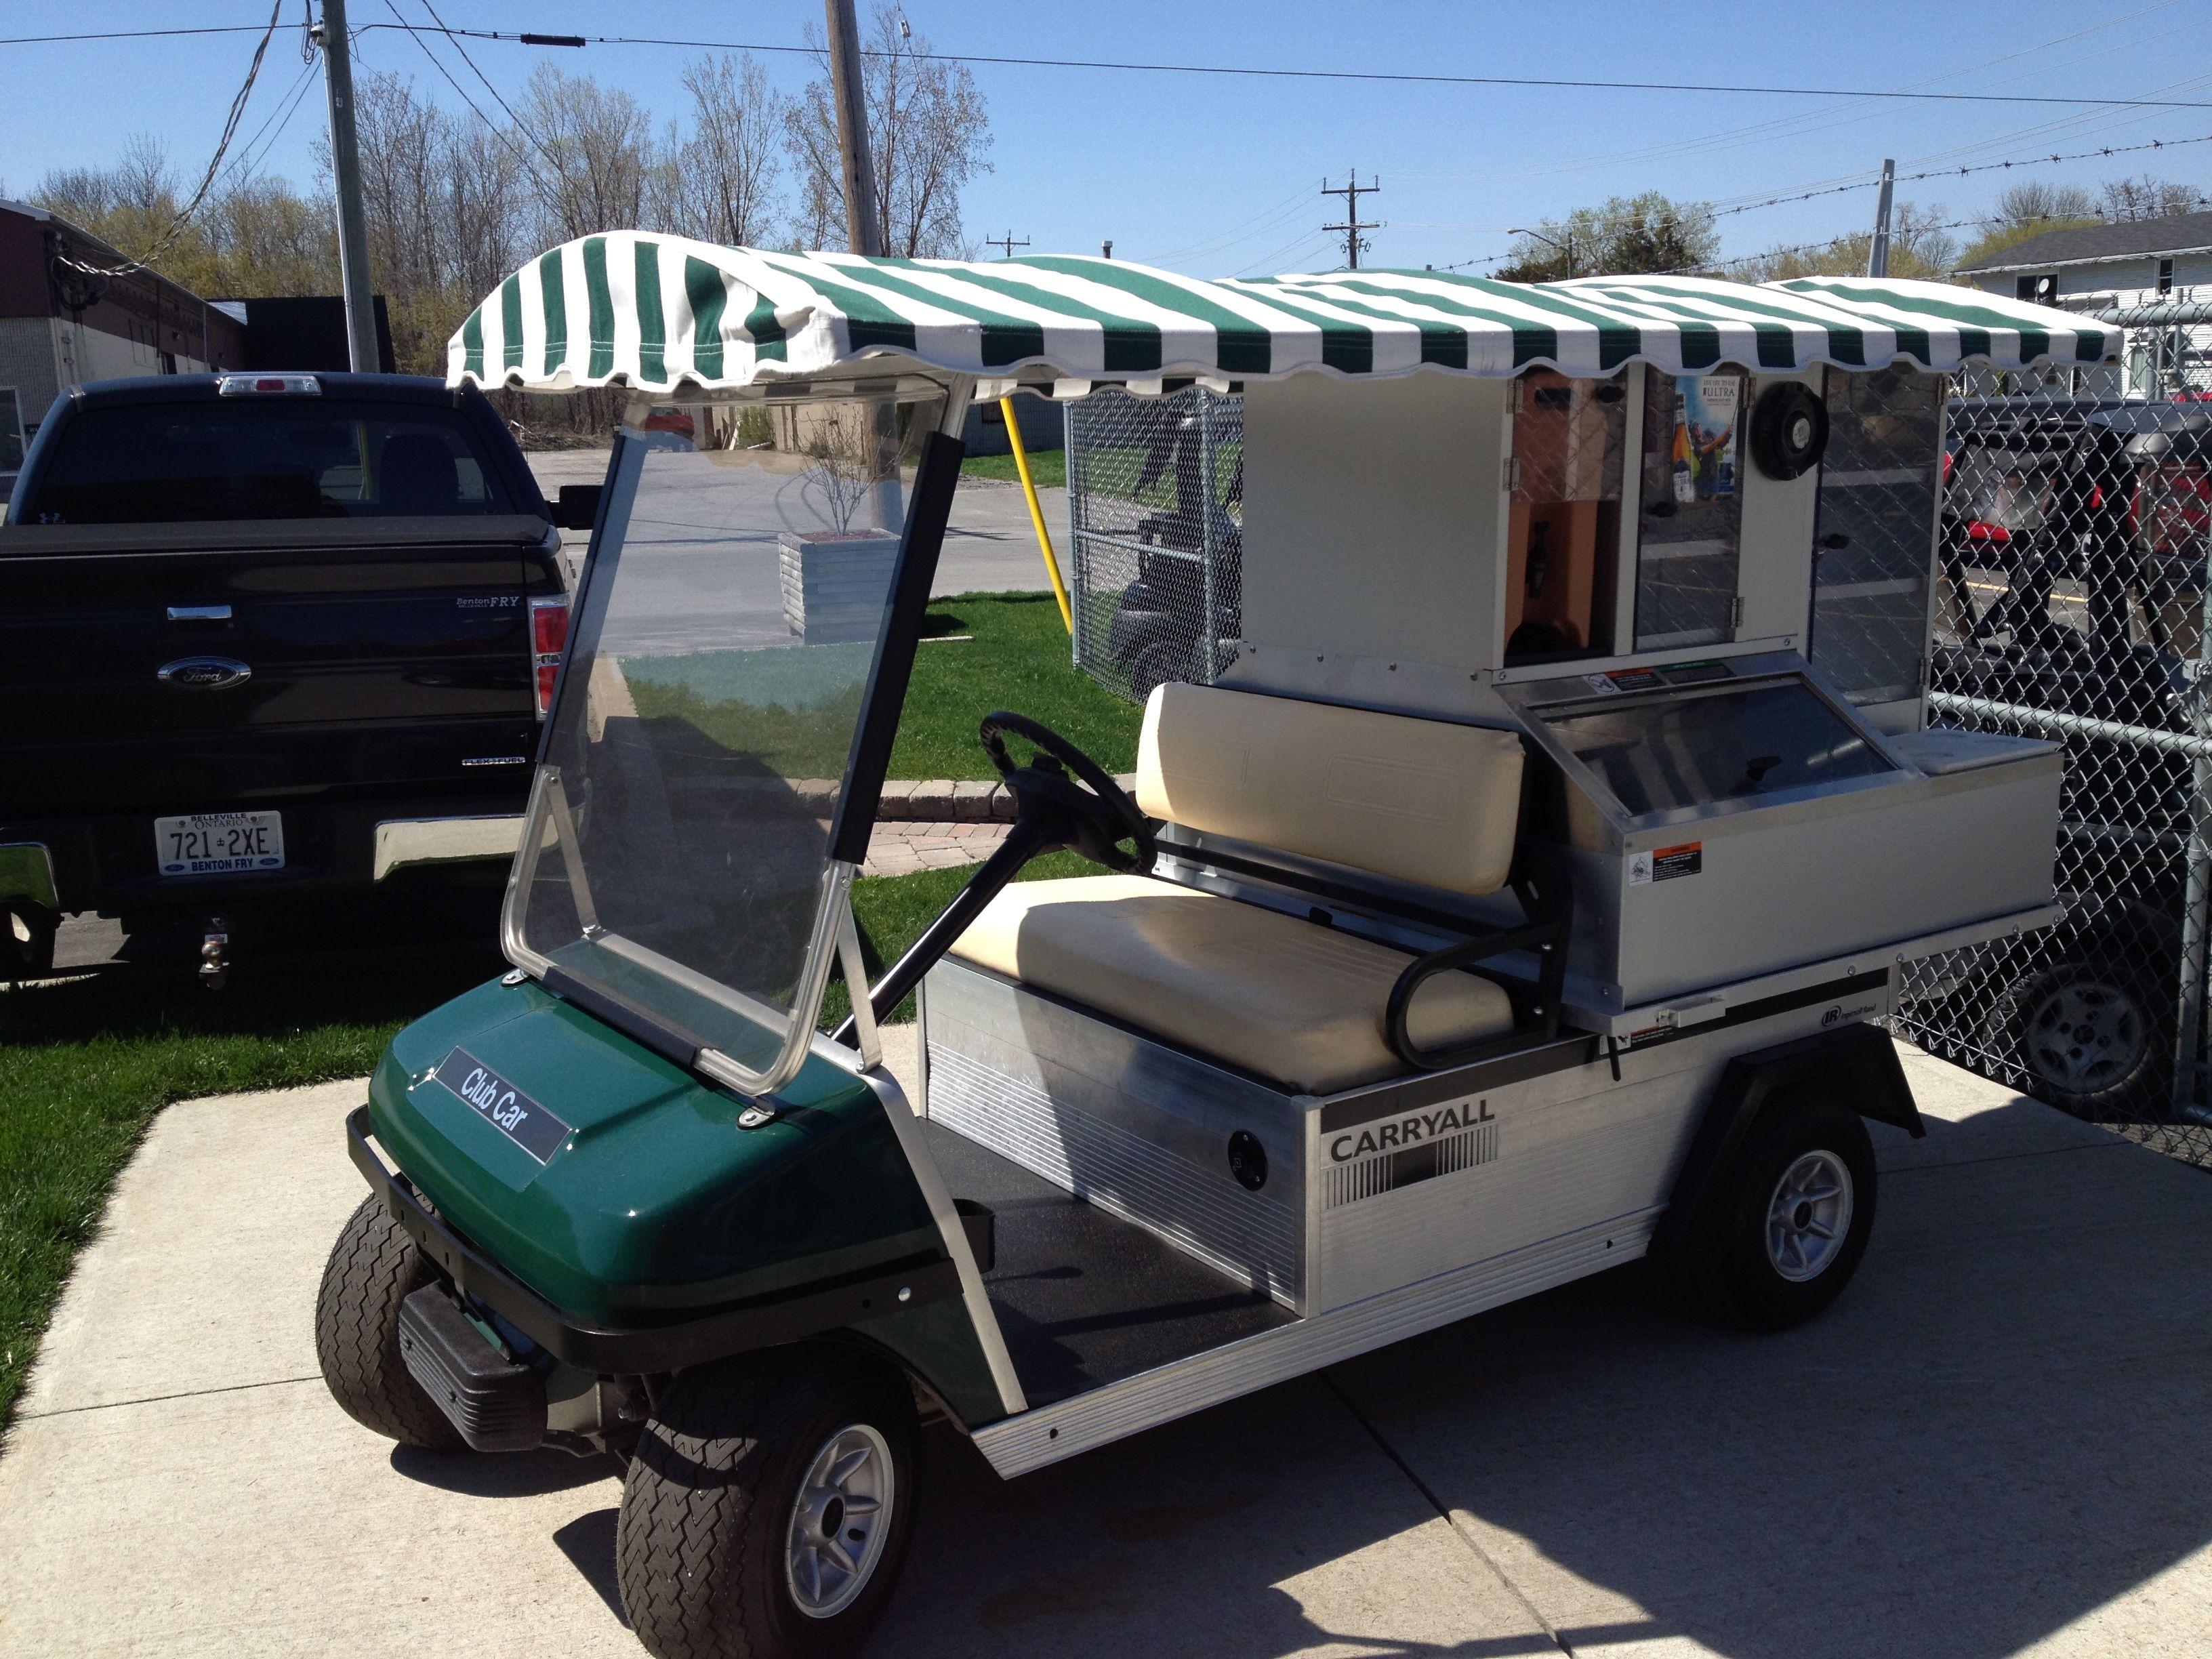 Now That S What I Call A Hotdog Cart Golf Carts Cart Cool Stuff